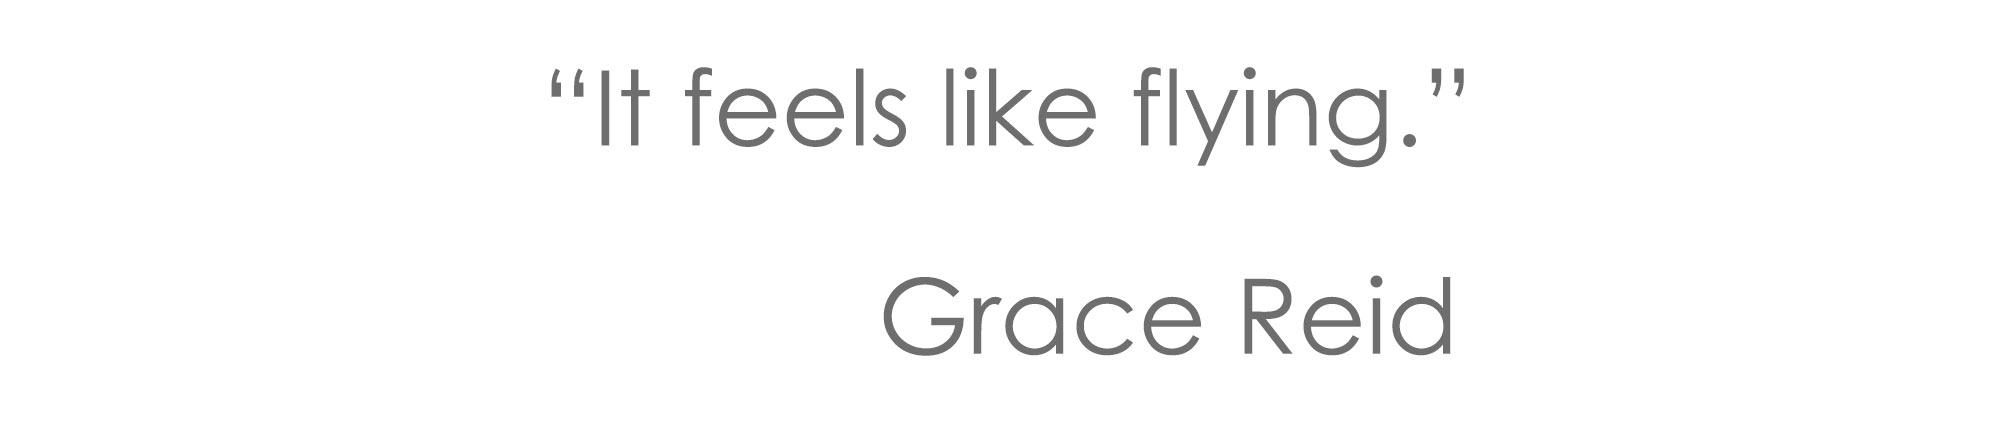 Grace-Reid-quote-25pt-text.jpg